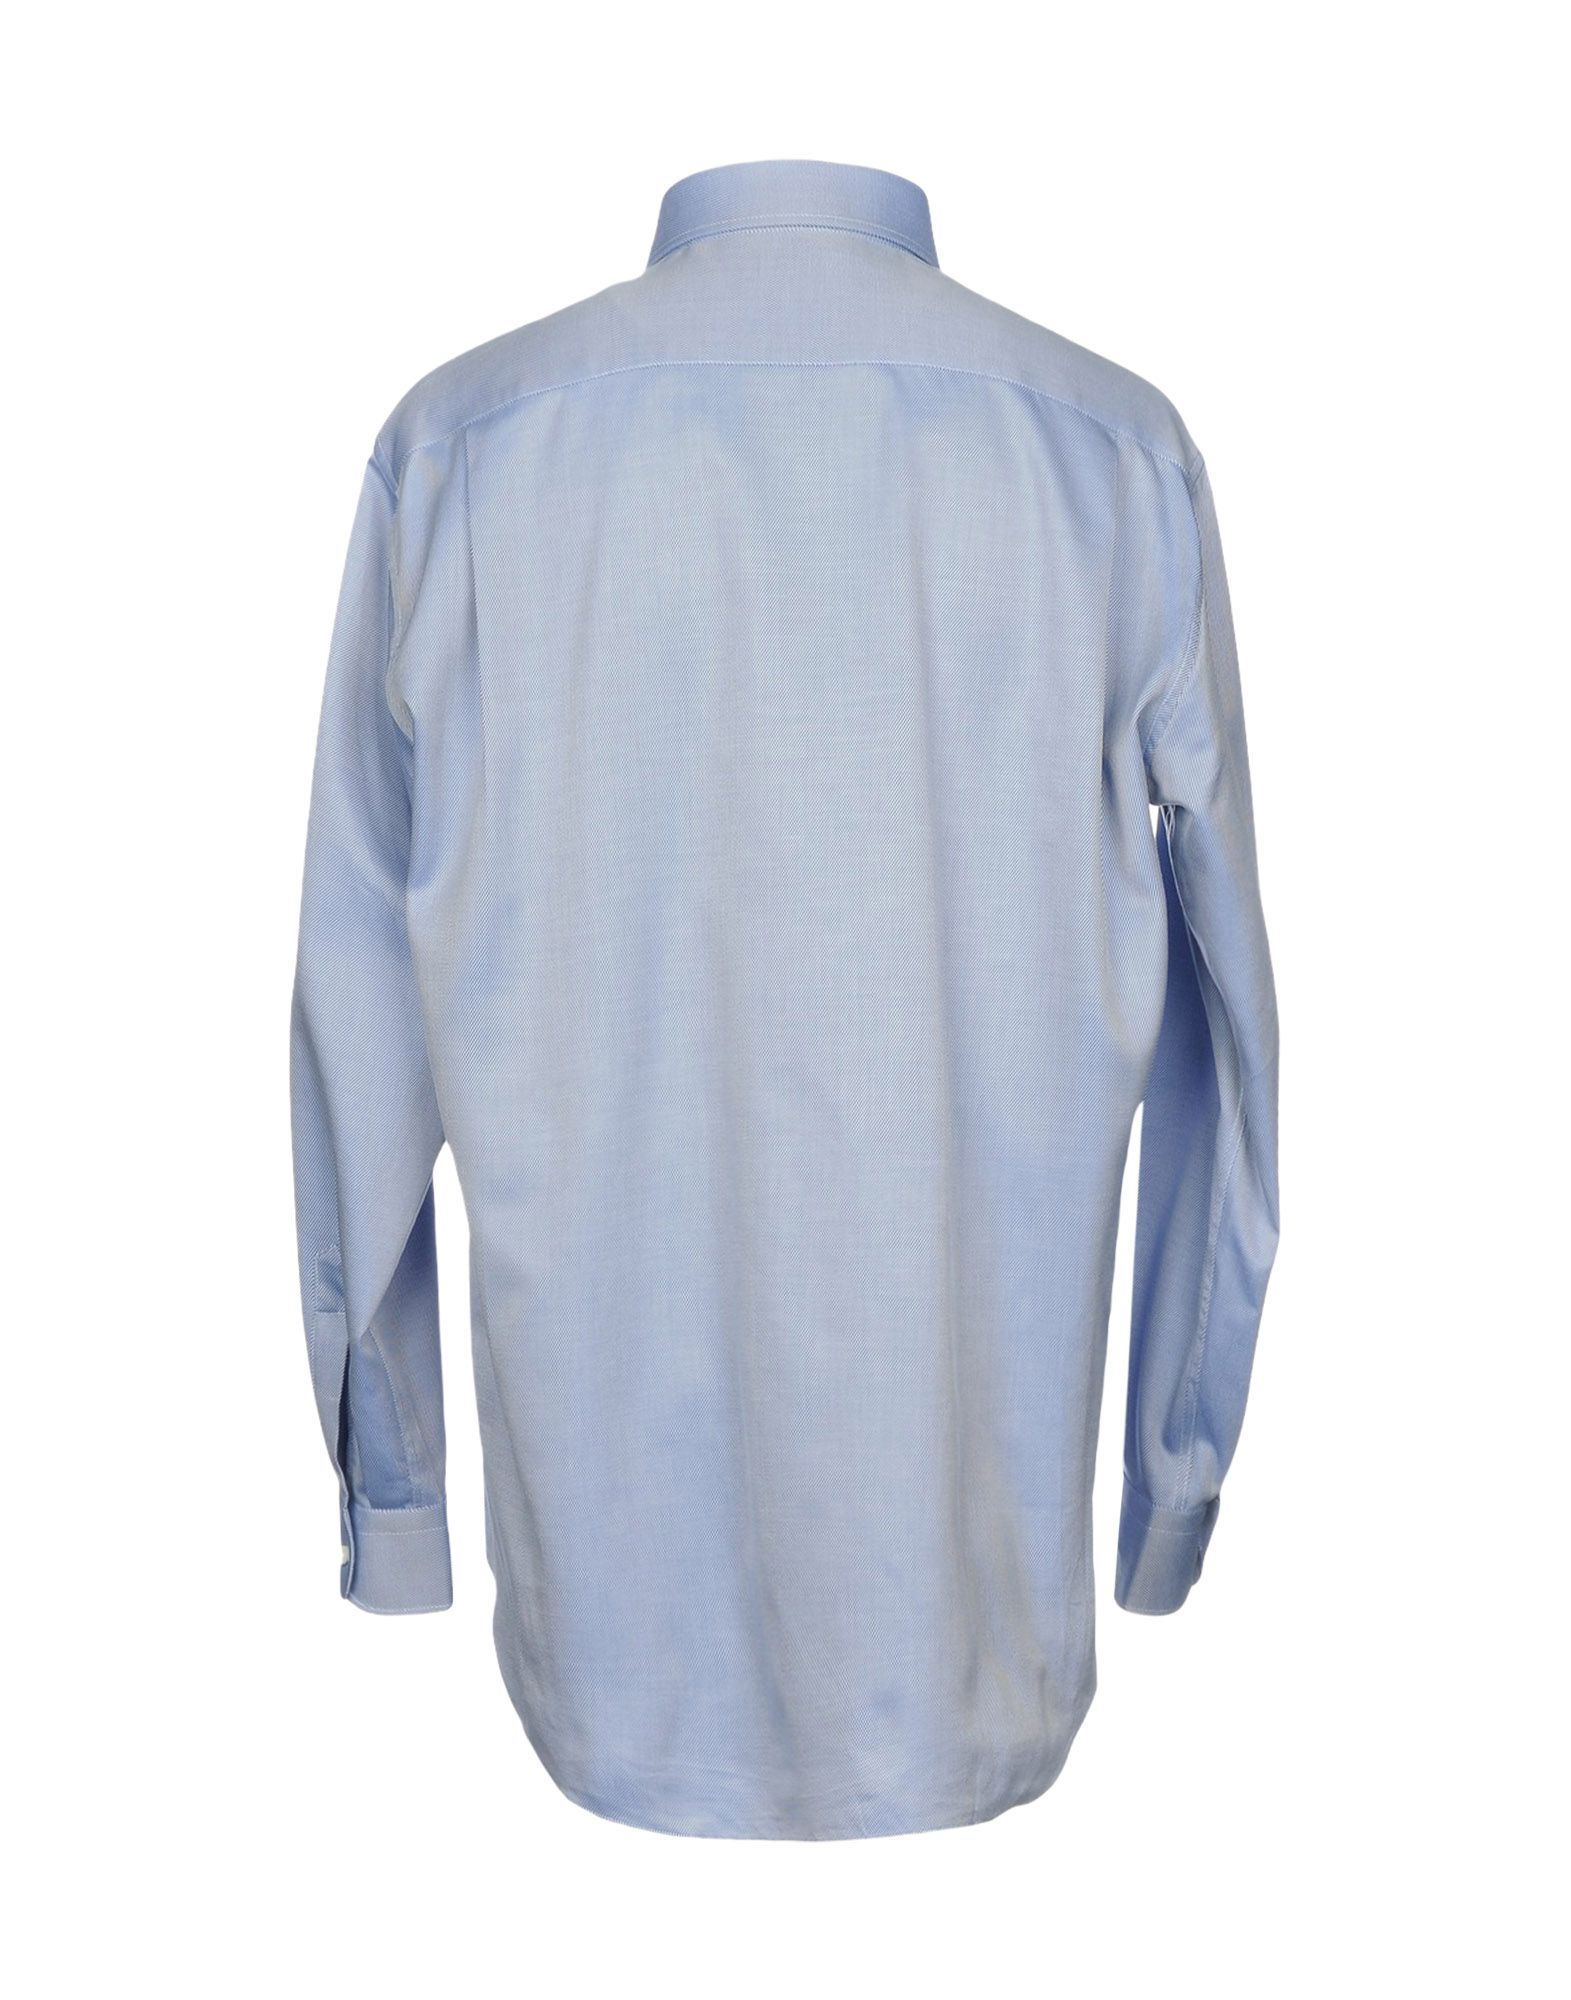 Camicia Camicia Camicia A Righe Gianmarco Bonaga Uomo - 38734908LX bccac3